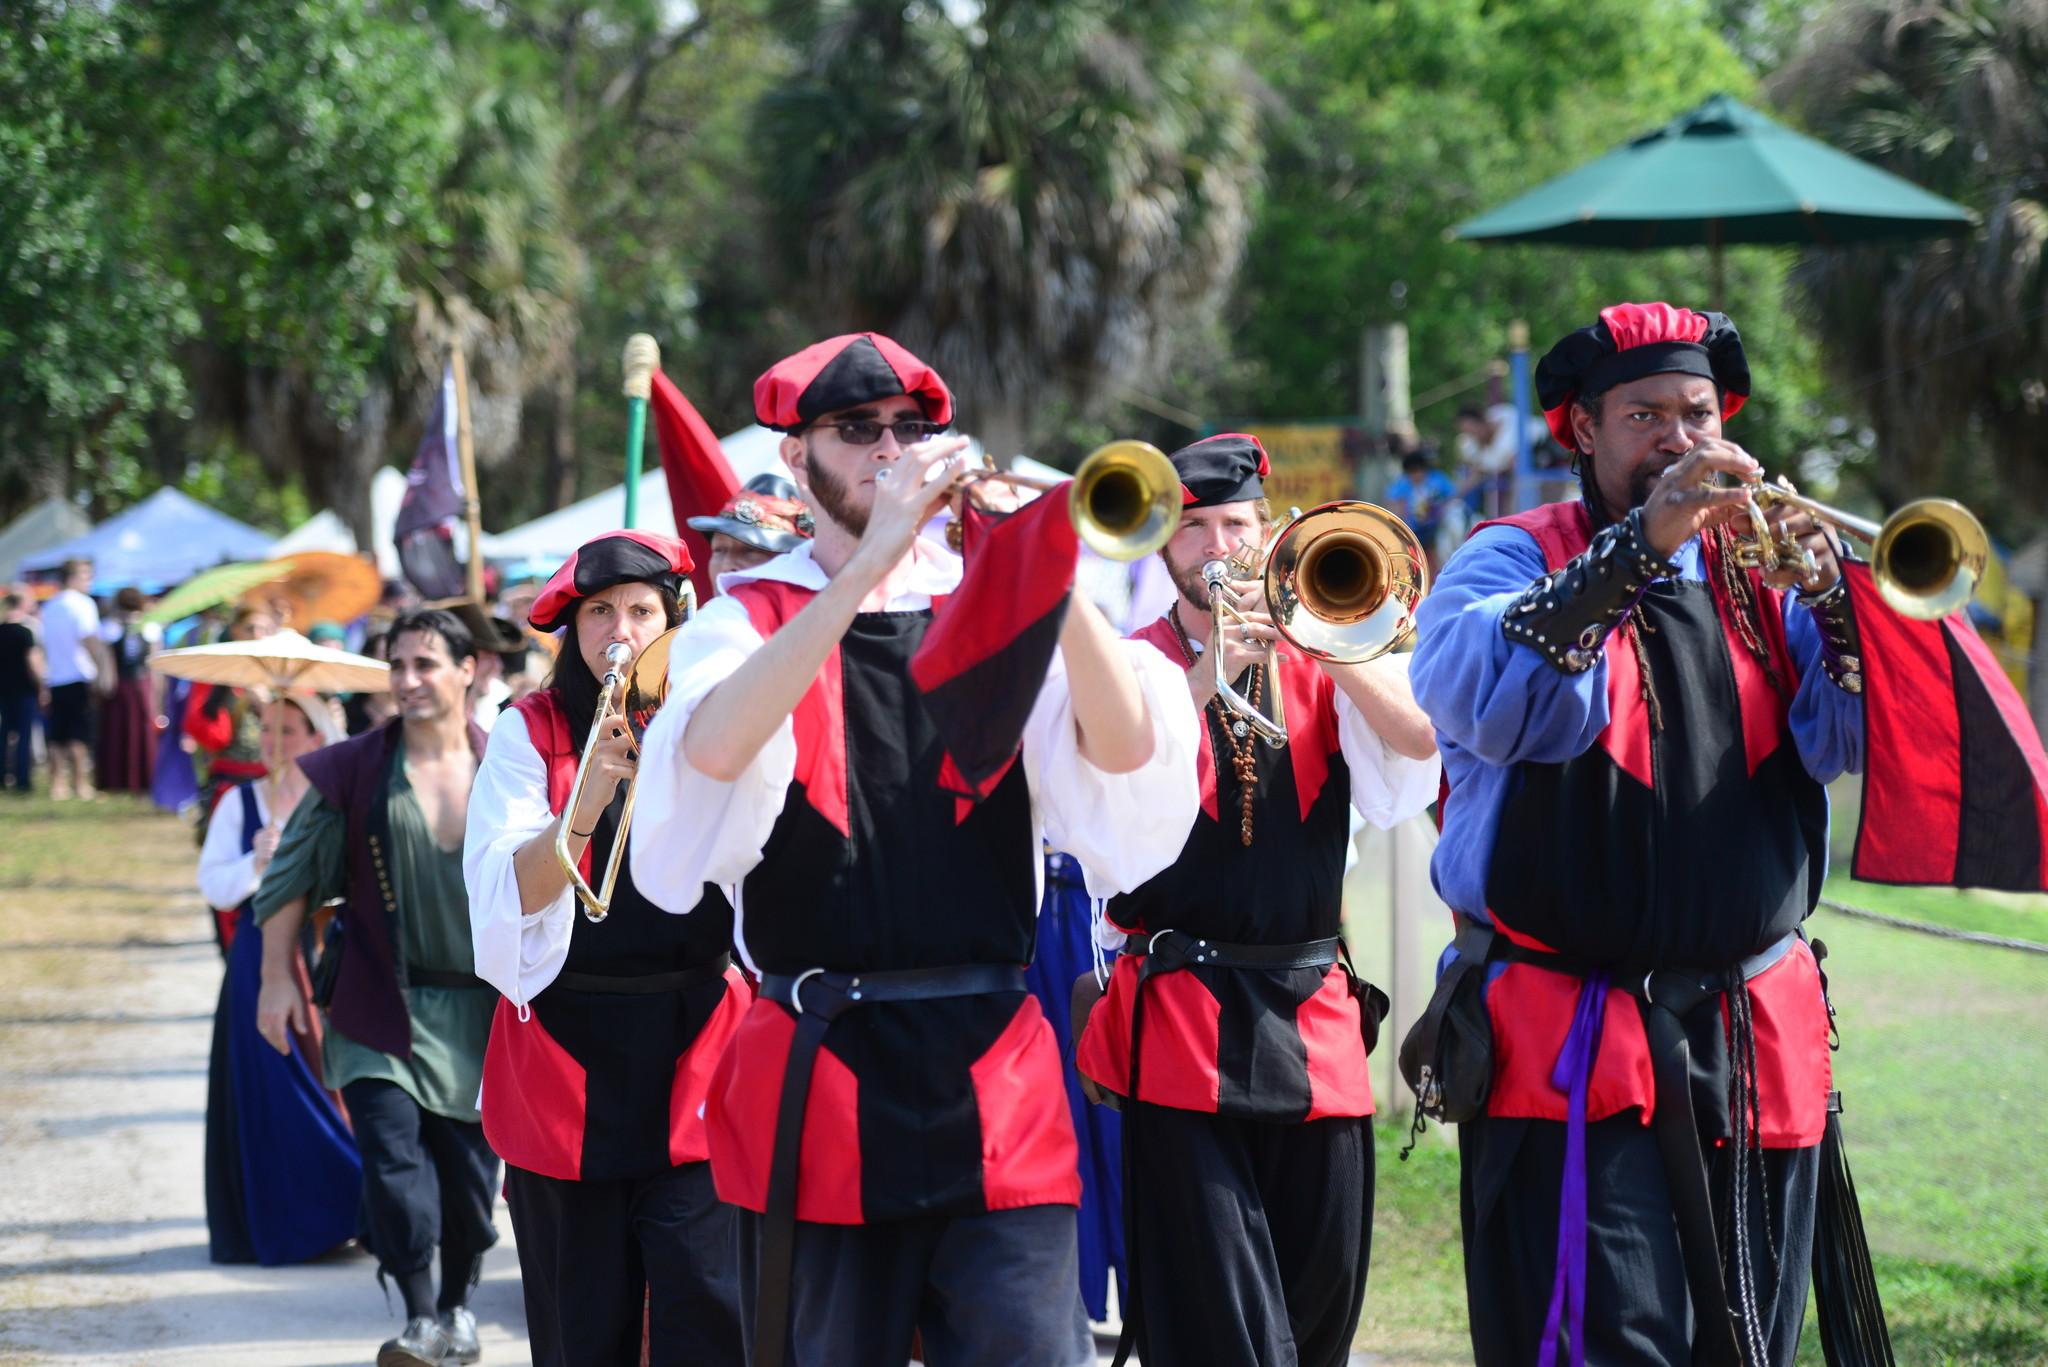 Renaissance Festival photos - Heraldry